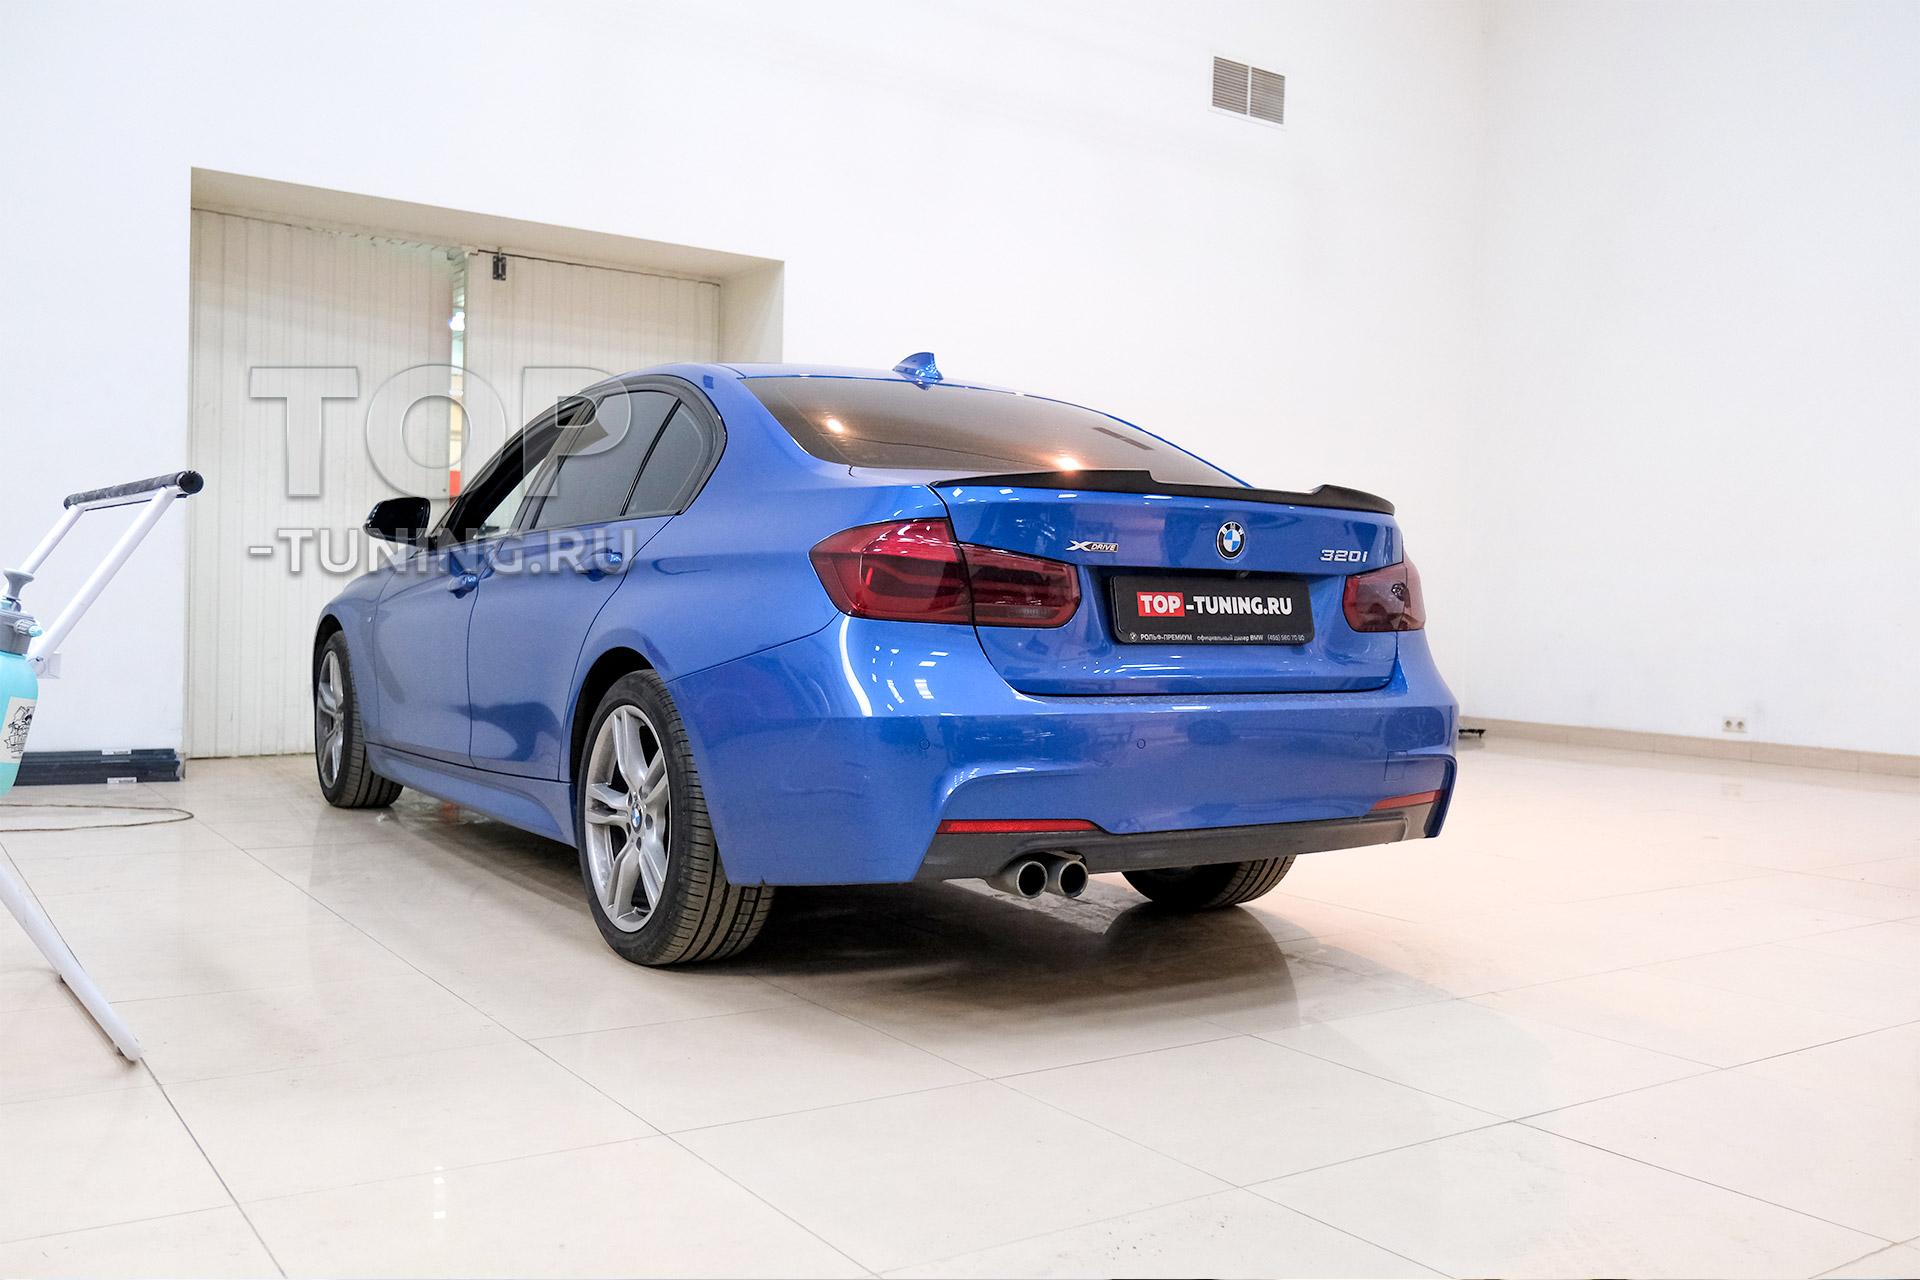 104240 Установка спойлера M-Style на BMW 3 F30 синего цвета